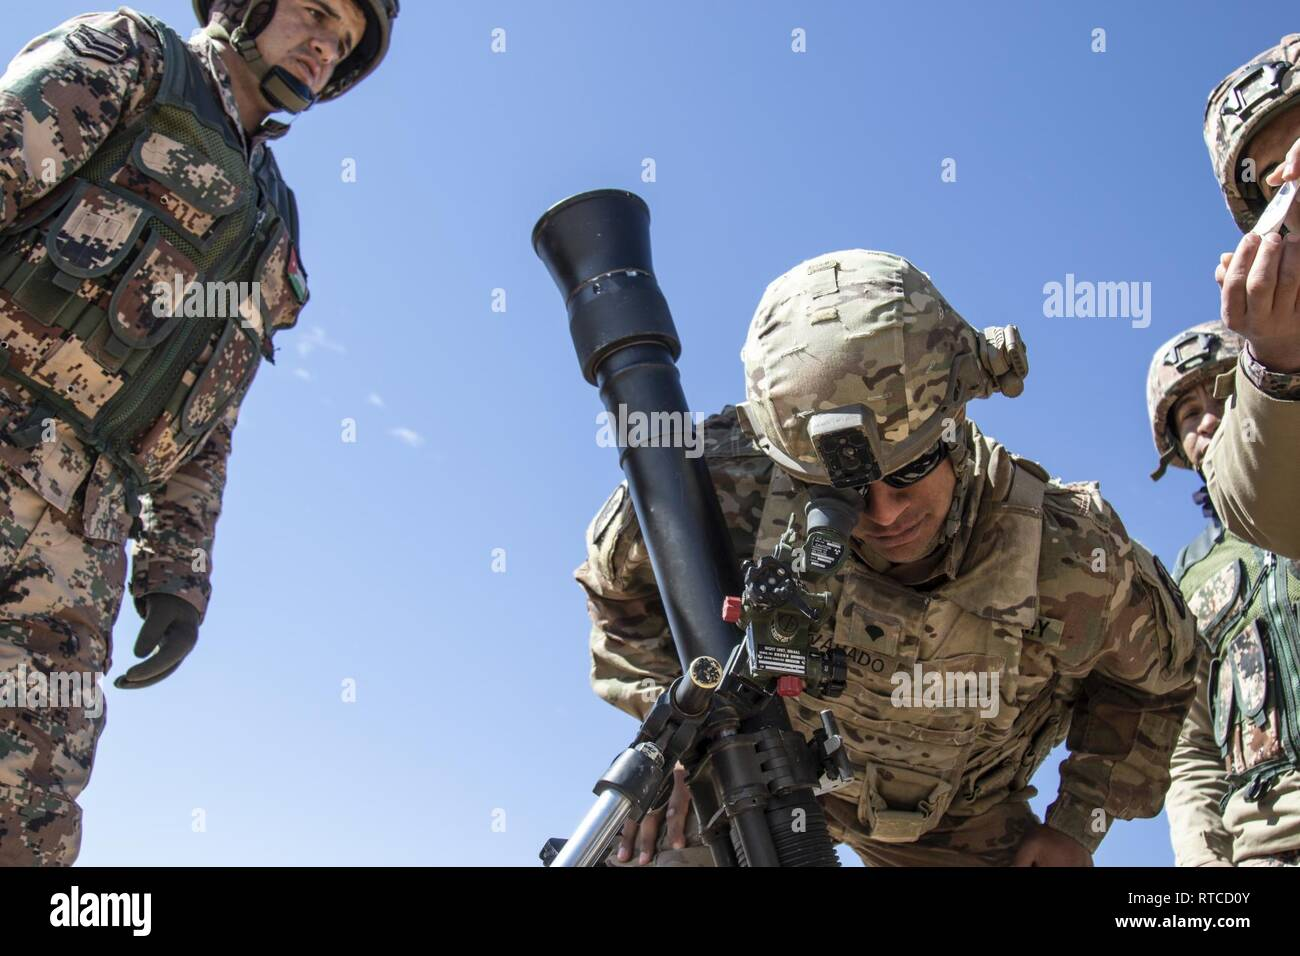 Spc  Jose Alvarado, a mortar gunner with the California National